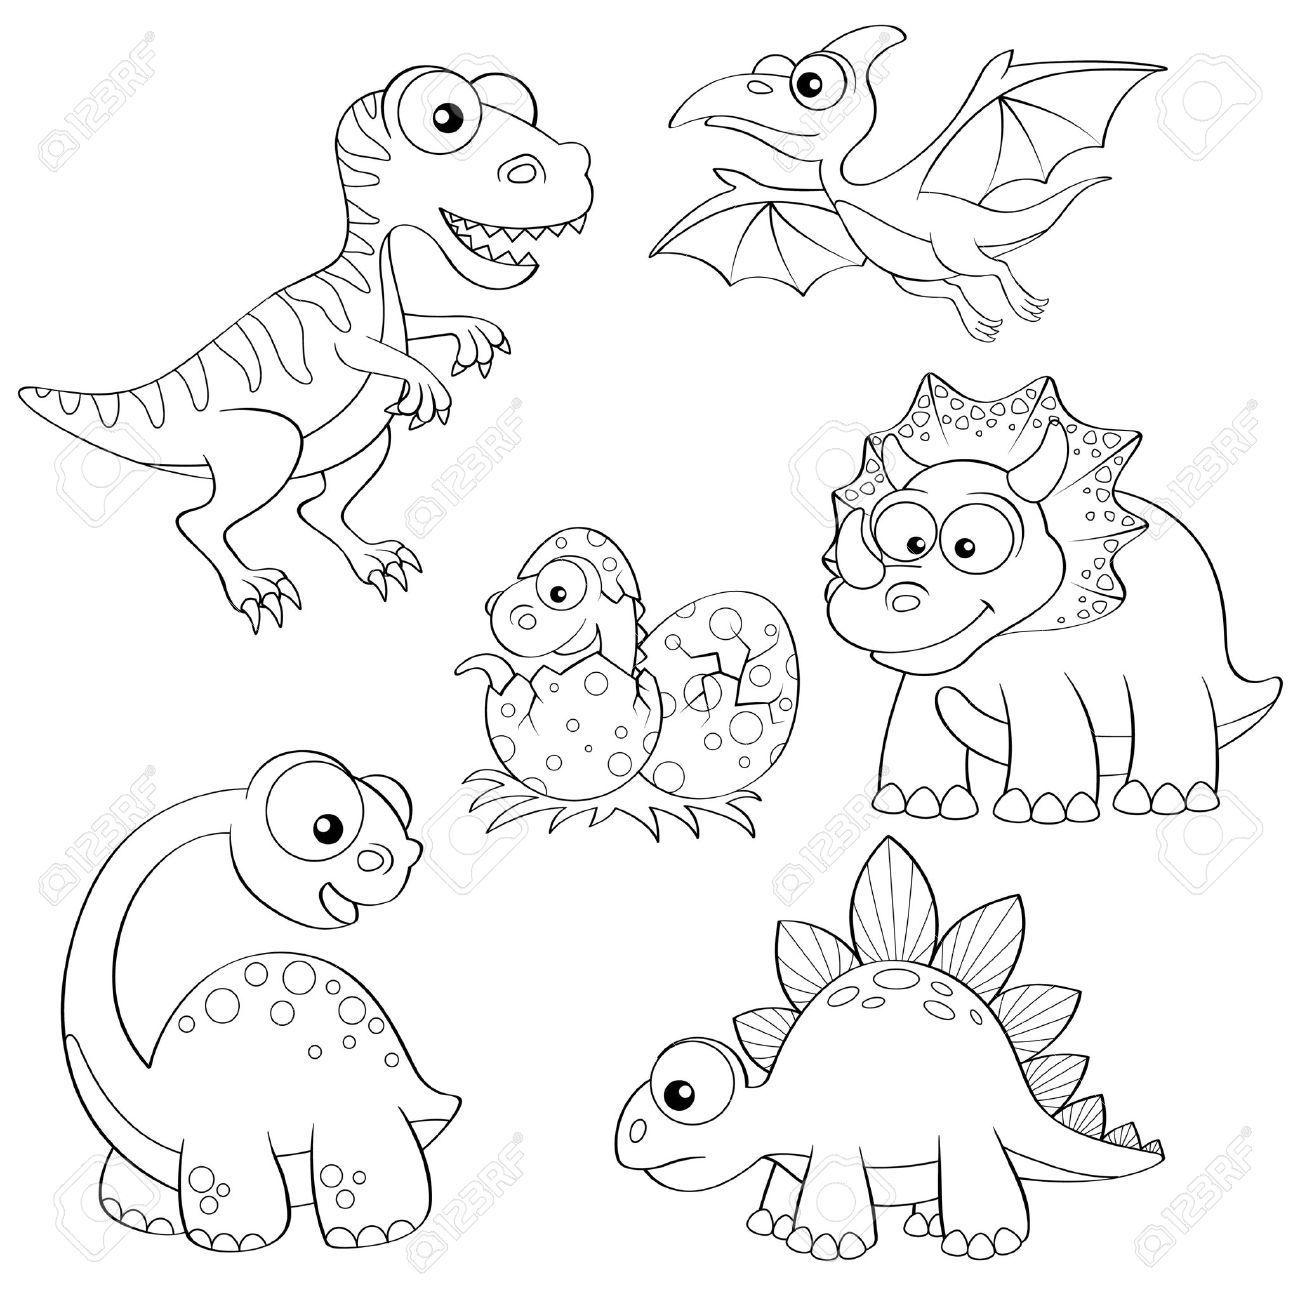 Illustration Dinosaurs Dinosaurs Cartoon Coloring Cartoon Black White B Libro De Dinosaurios Para Colorear Dibujos Imagenes De Dinosaurios Animados